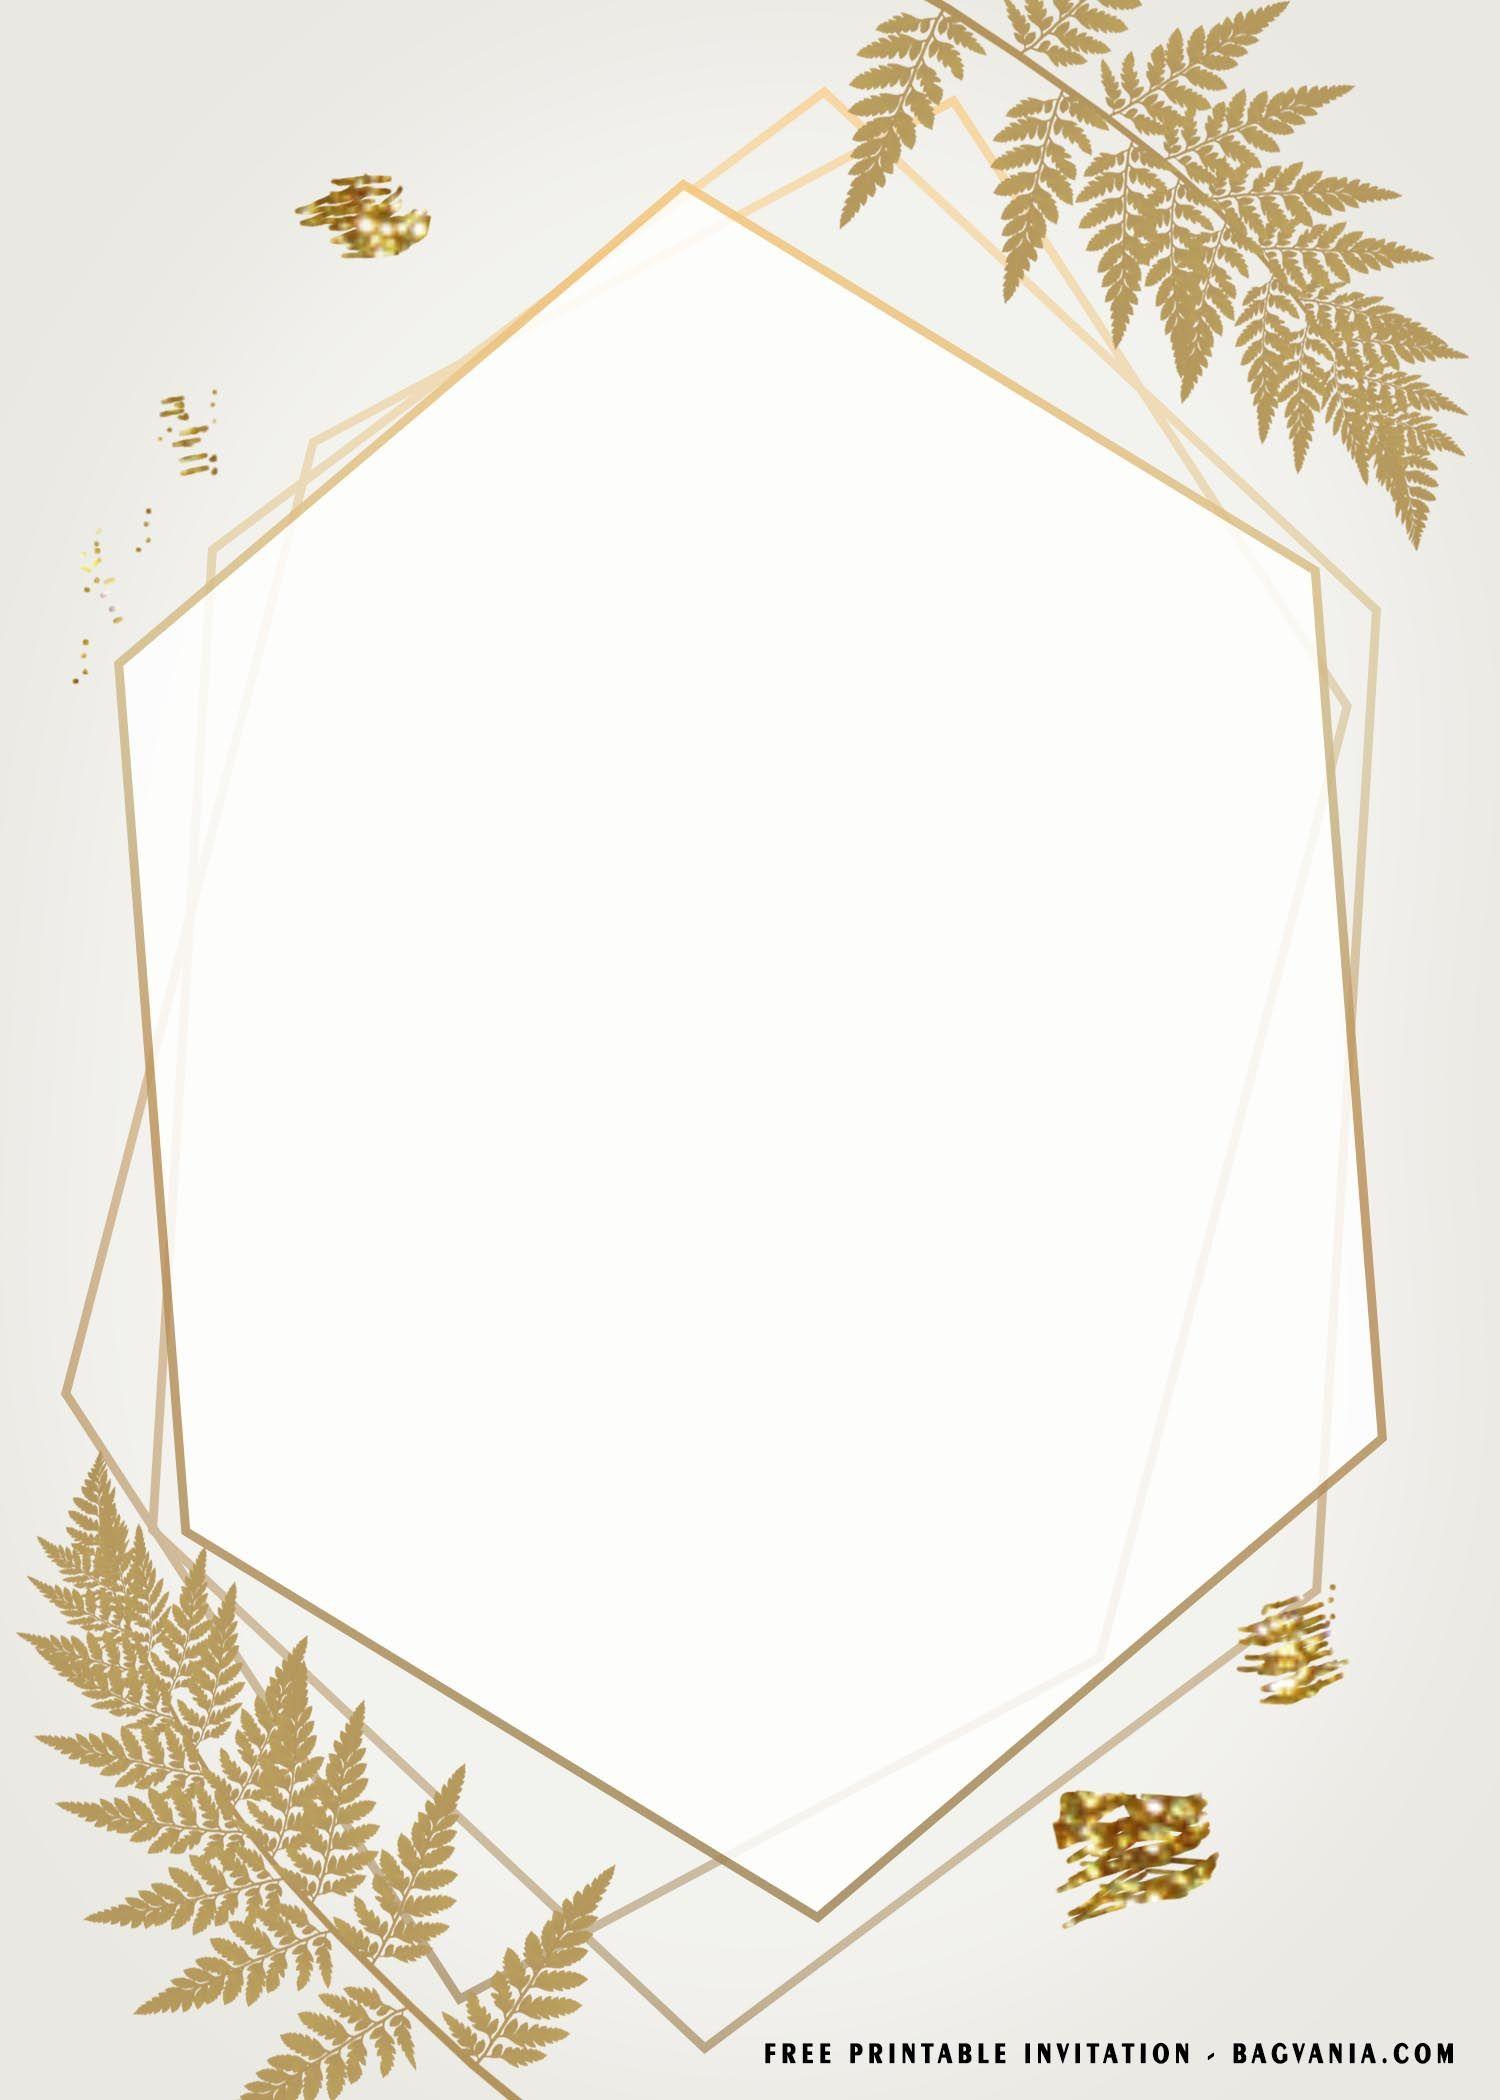 Free Printable Gold Frame Baby Shower Invitation Templates Baby Shower Invitation Templates Baby Shower Invitations Free Printable Invitations Templates